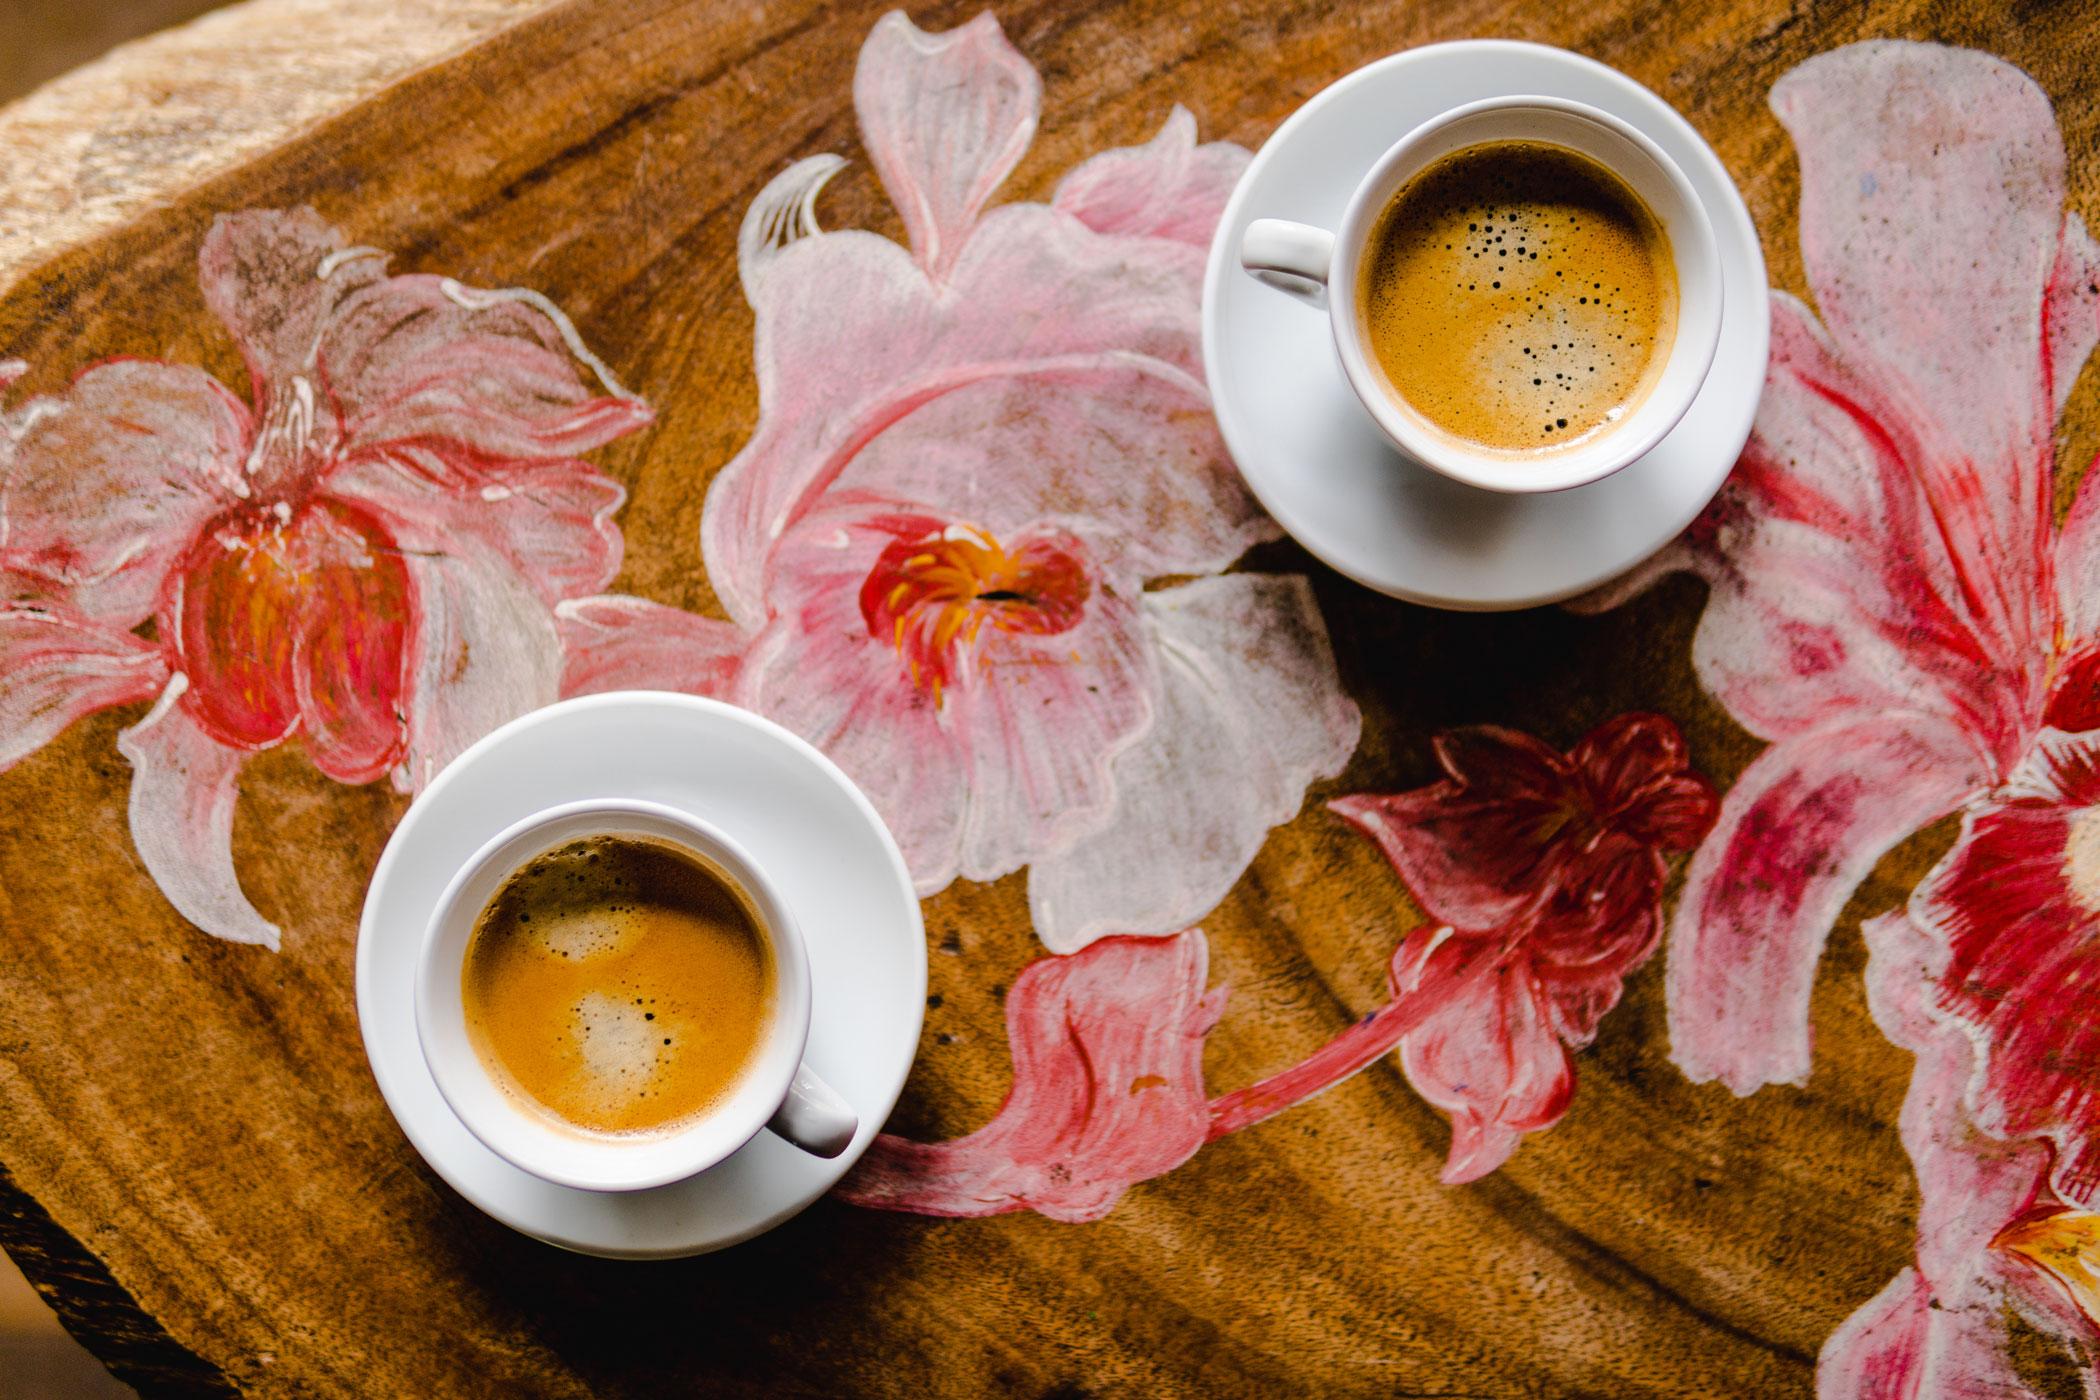 colombia-coffee-final-HR-0160.jpg